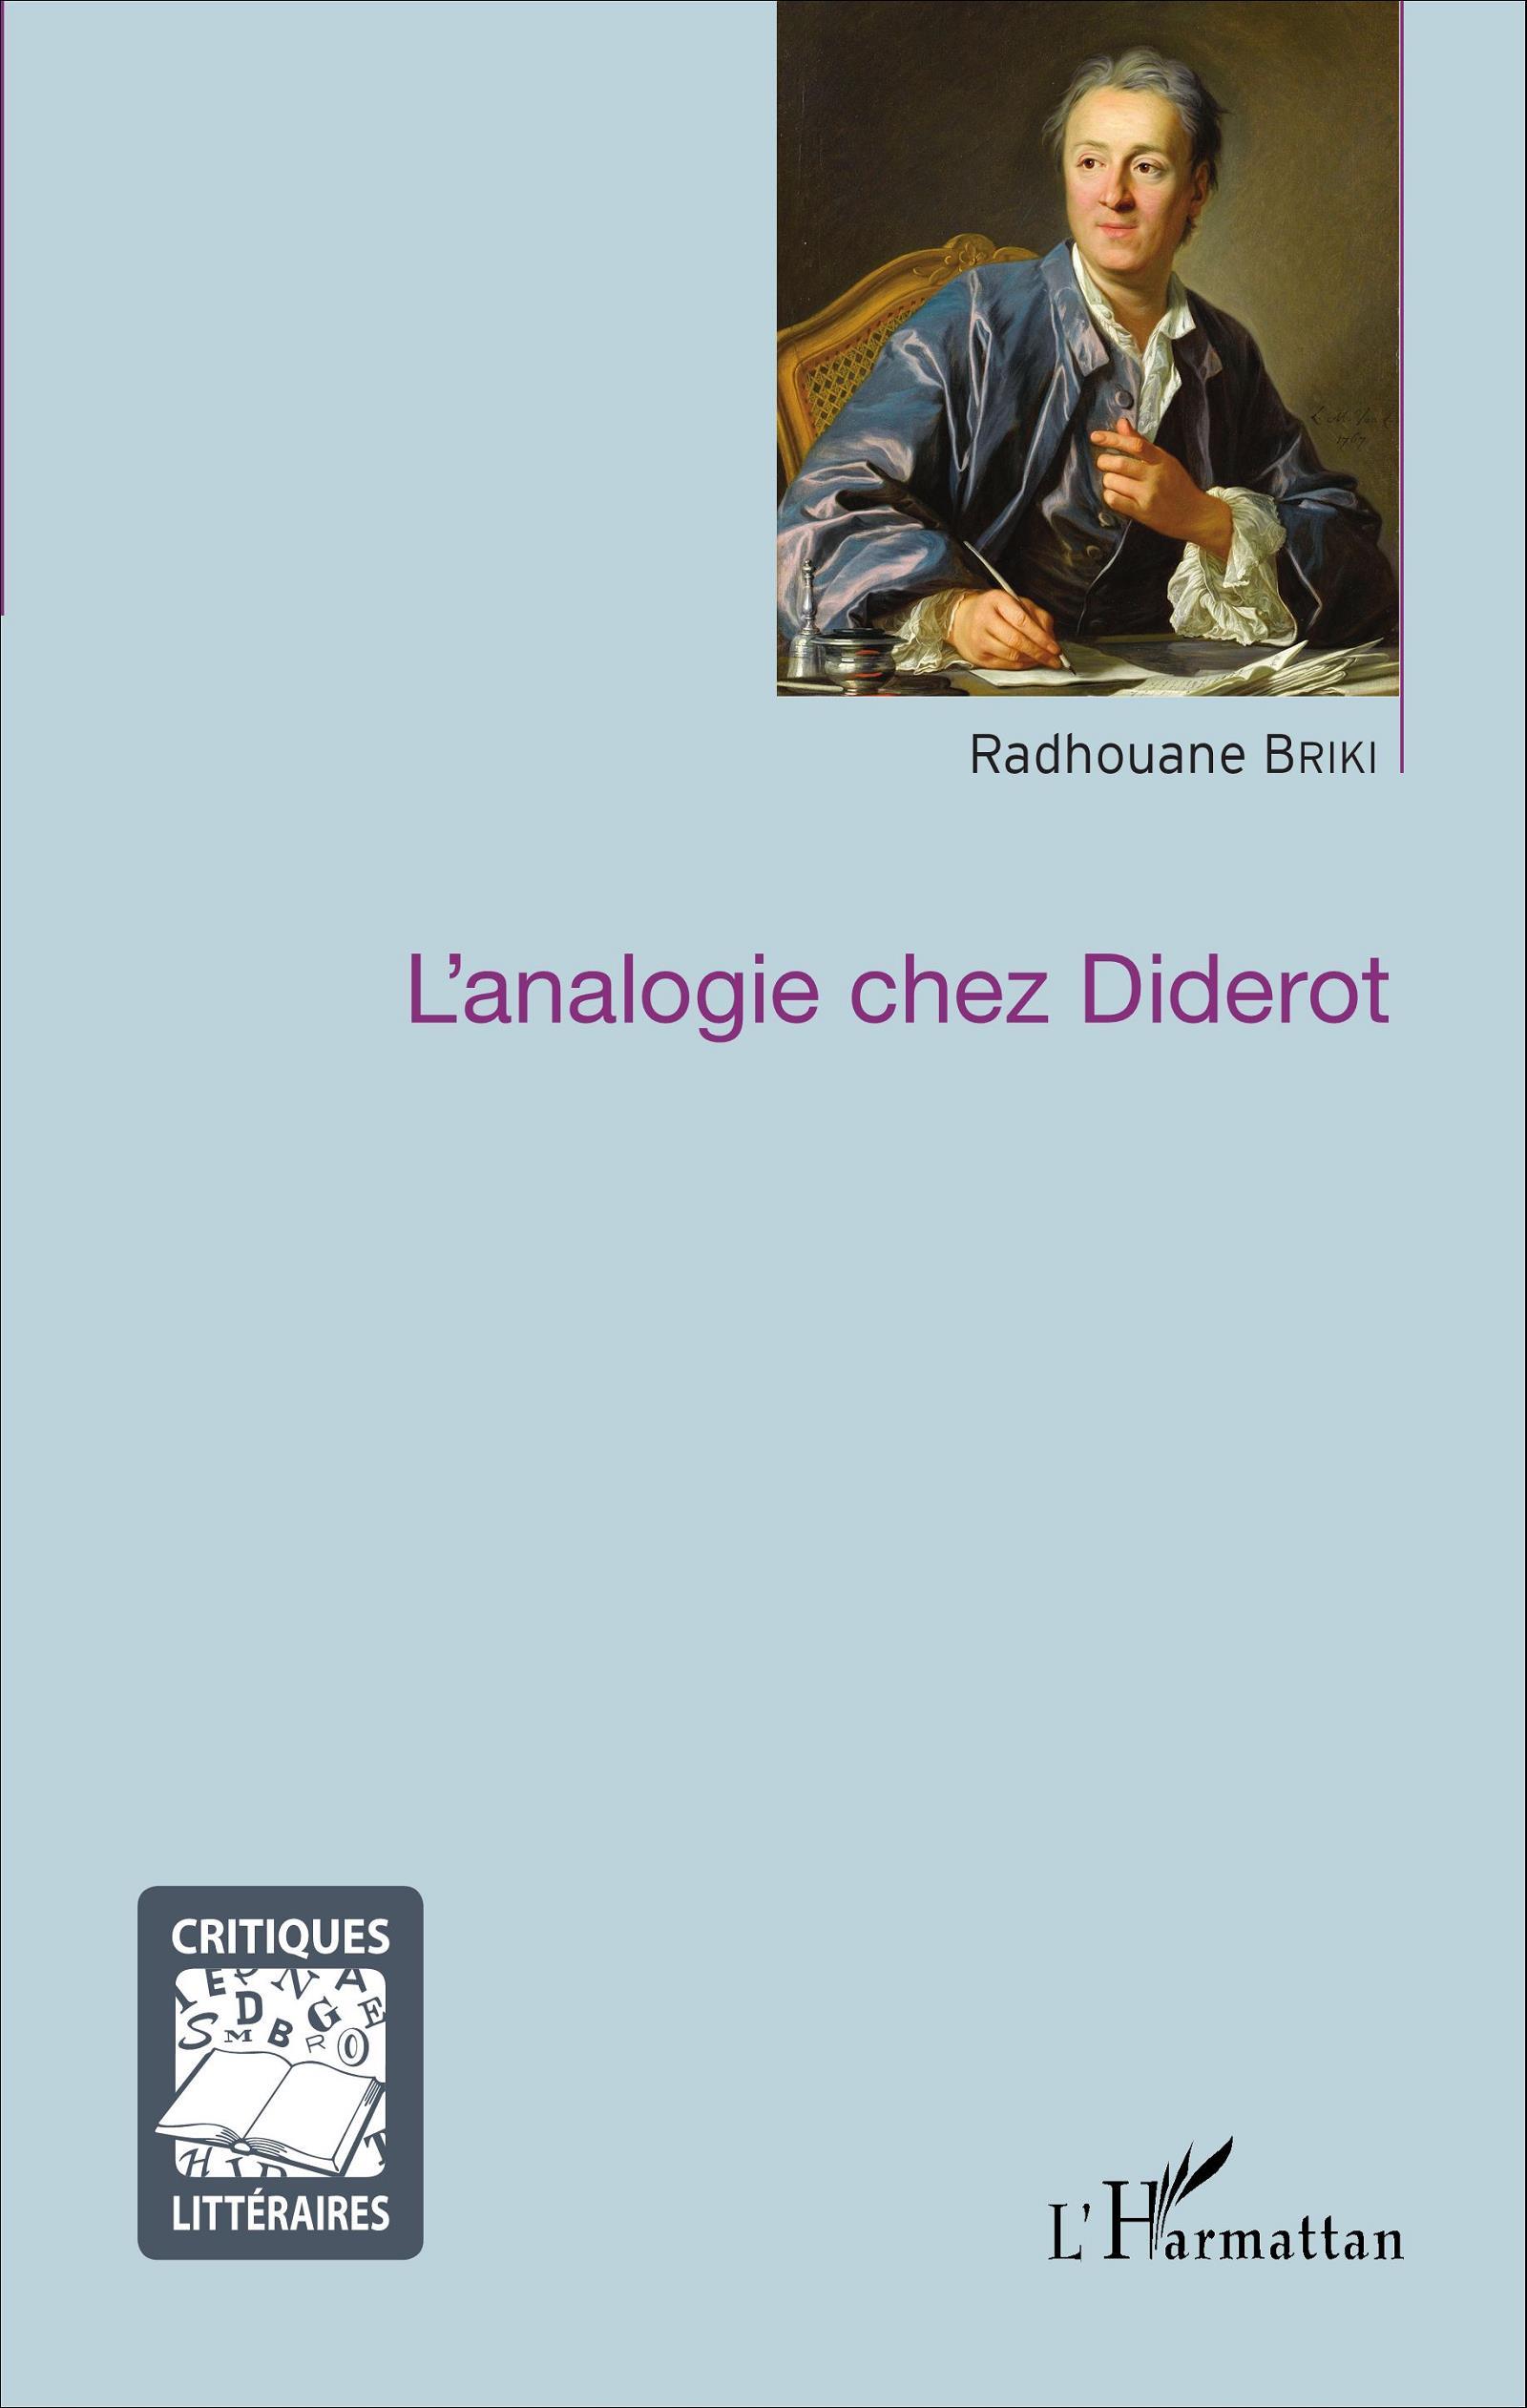 R. Briki, L'Analogie chez Diderot